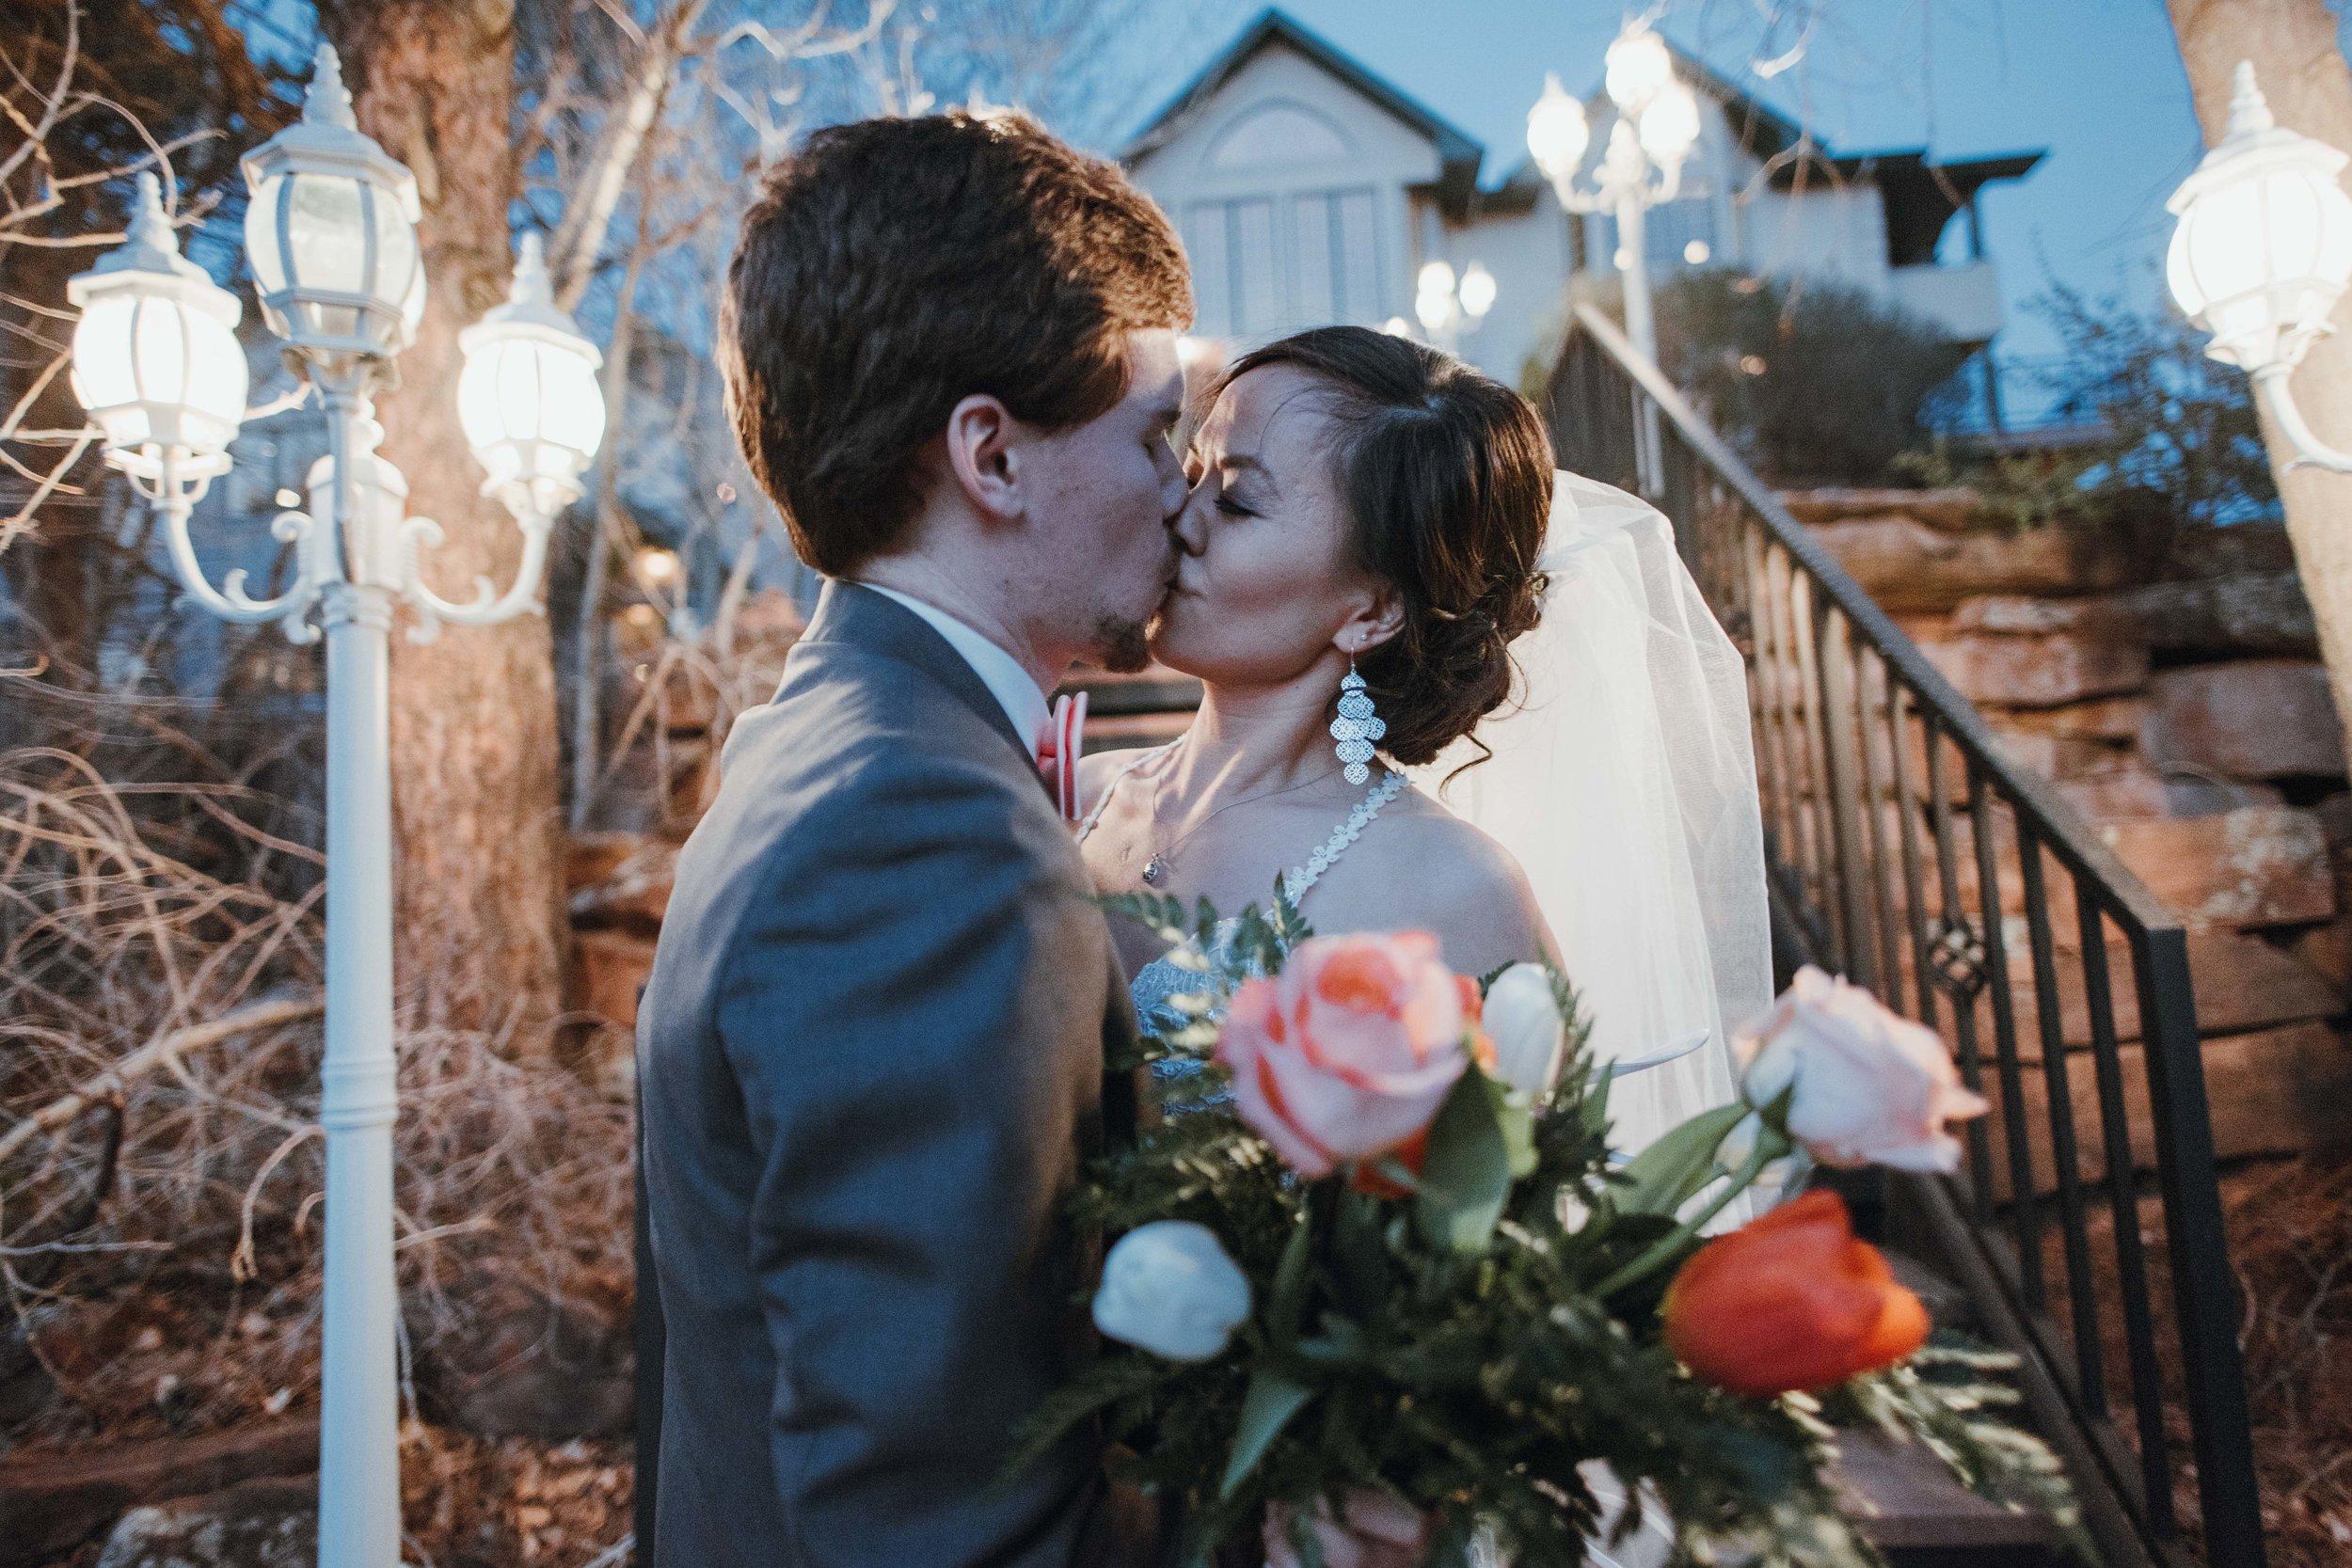 denver wedding photographer lioncrest manor in lyons ben and mali -DSC_0745.jpg